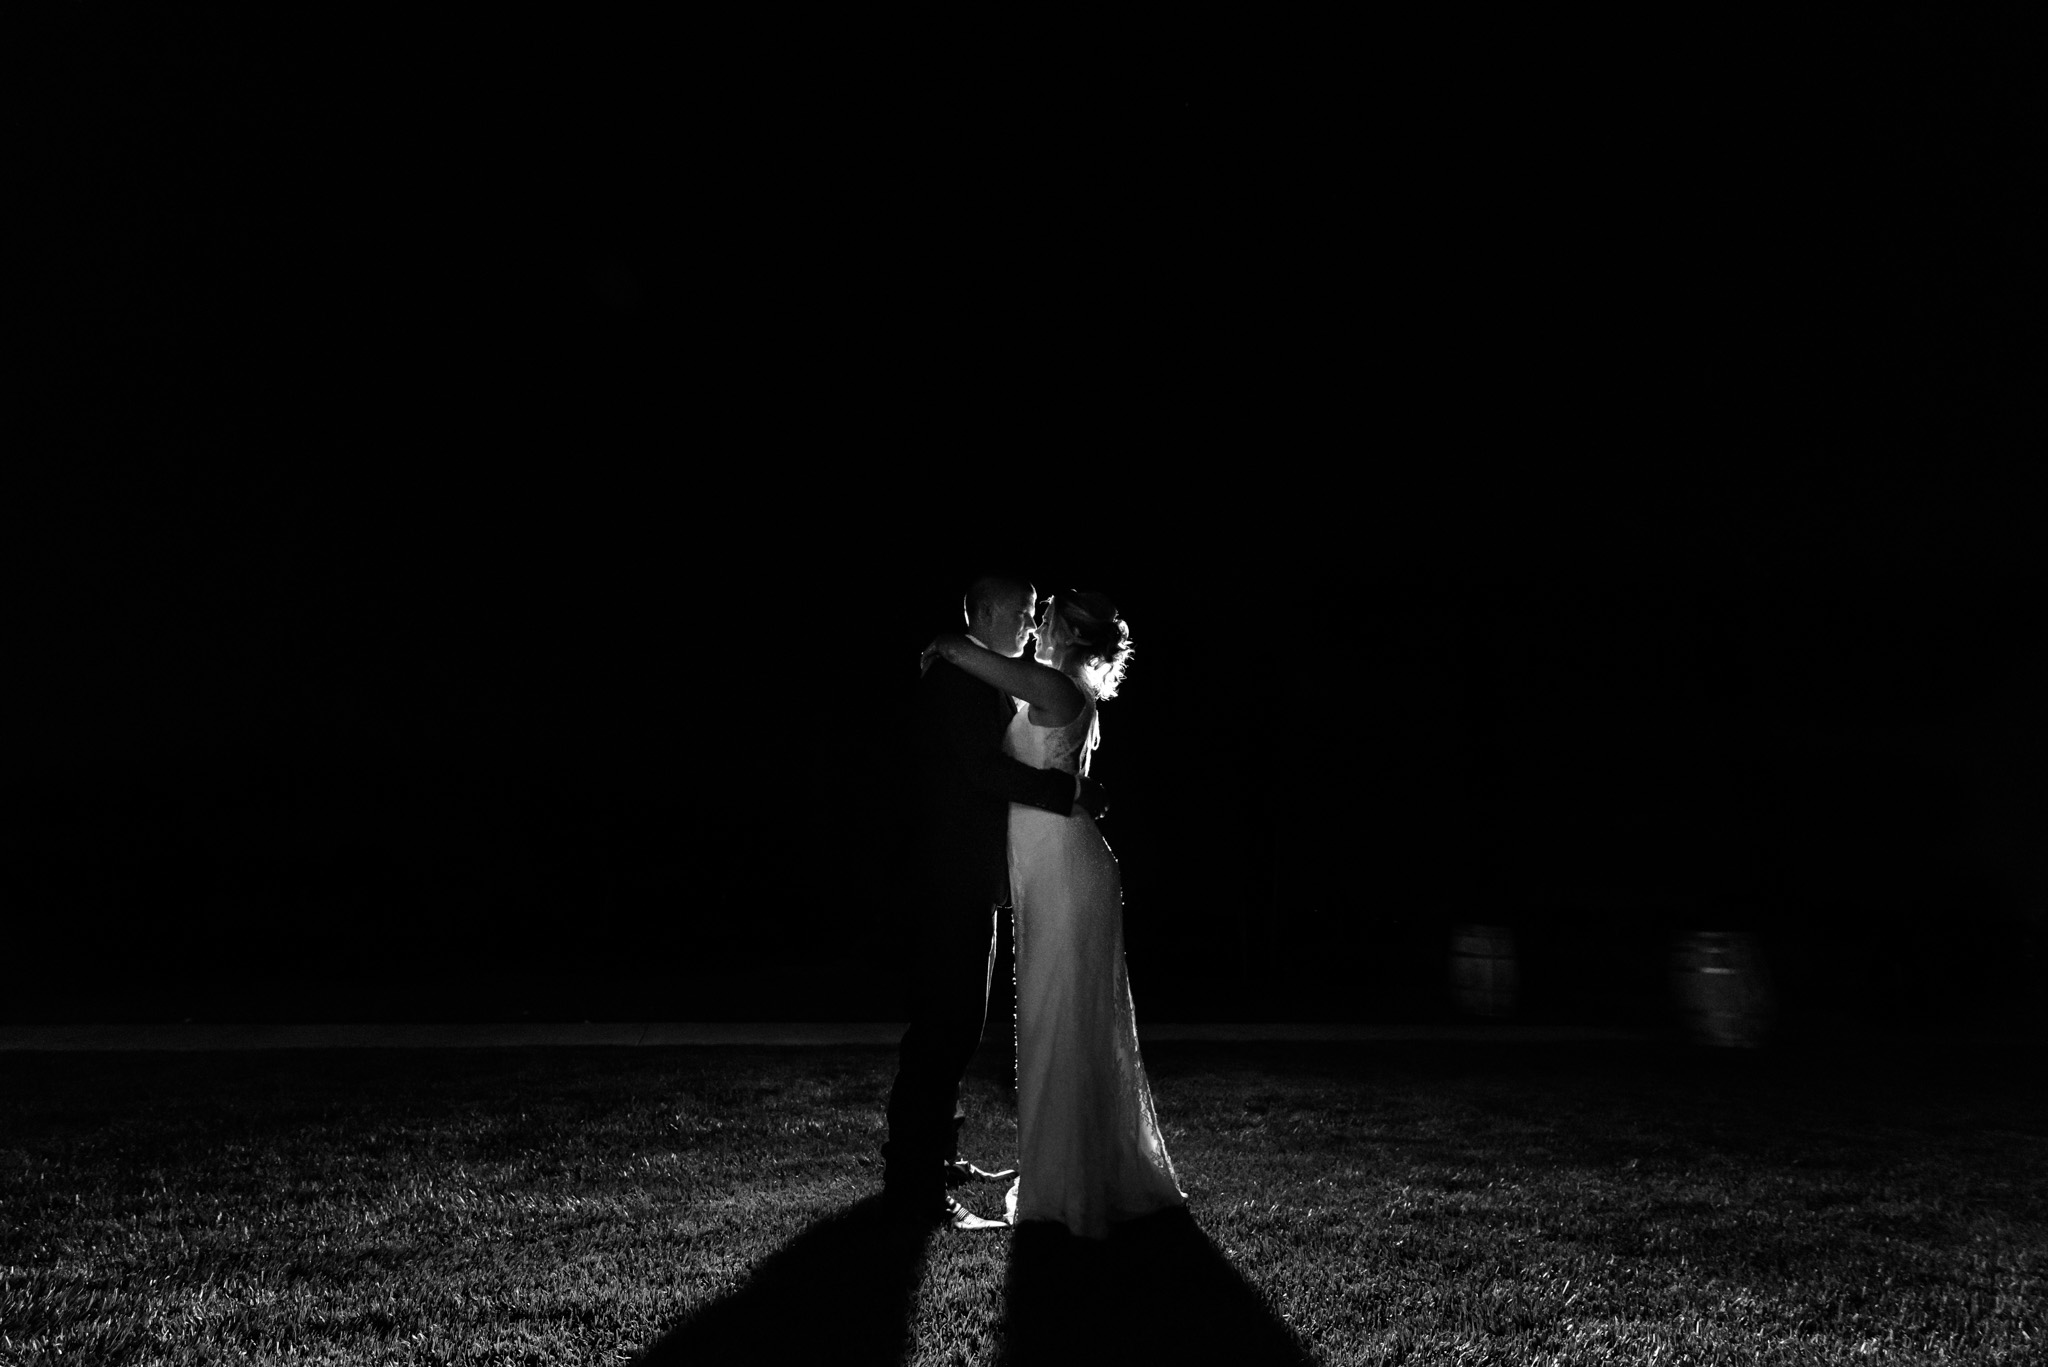 Avensole-Winery-Temecula-Wedding-Josh-and-Olivia-4394.JPG